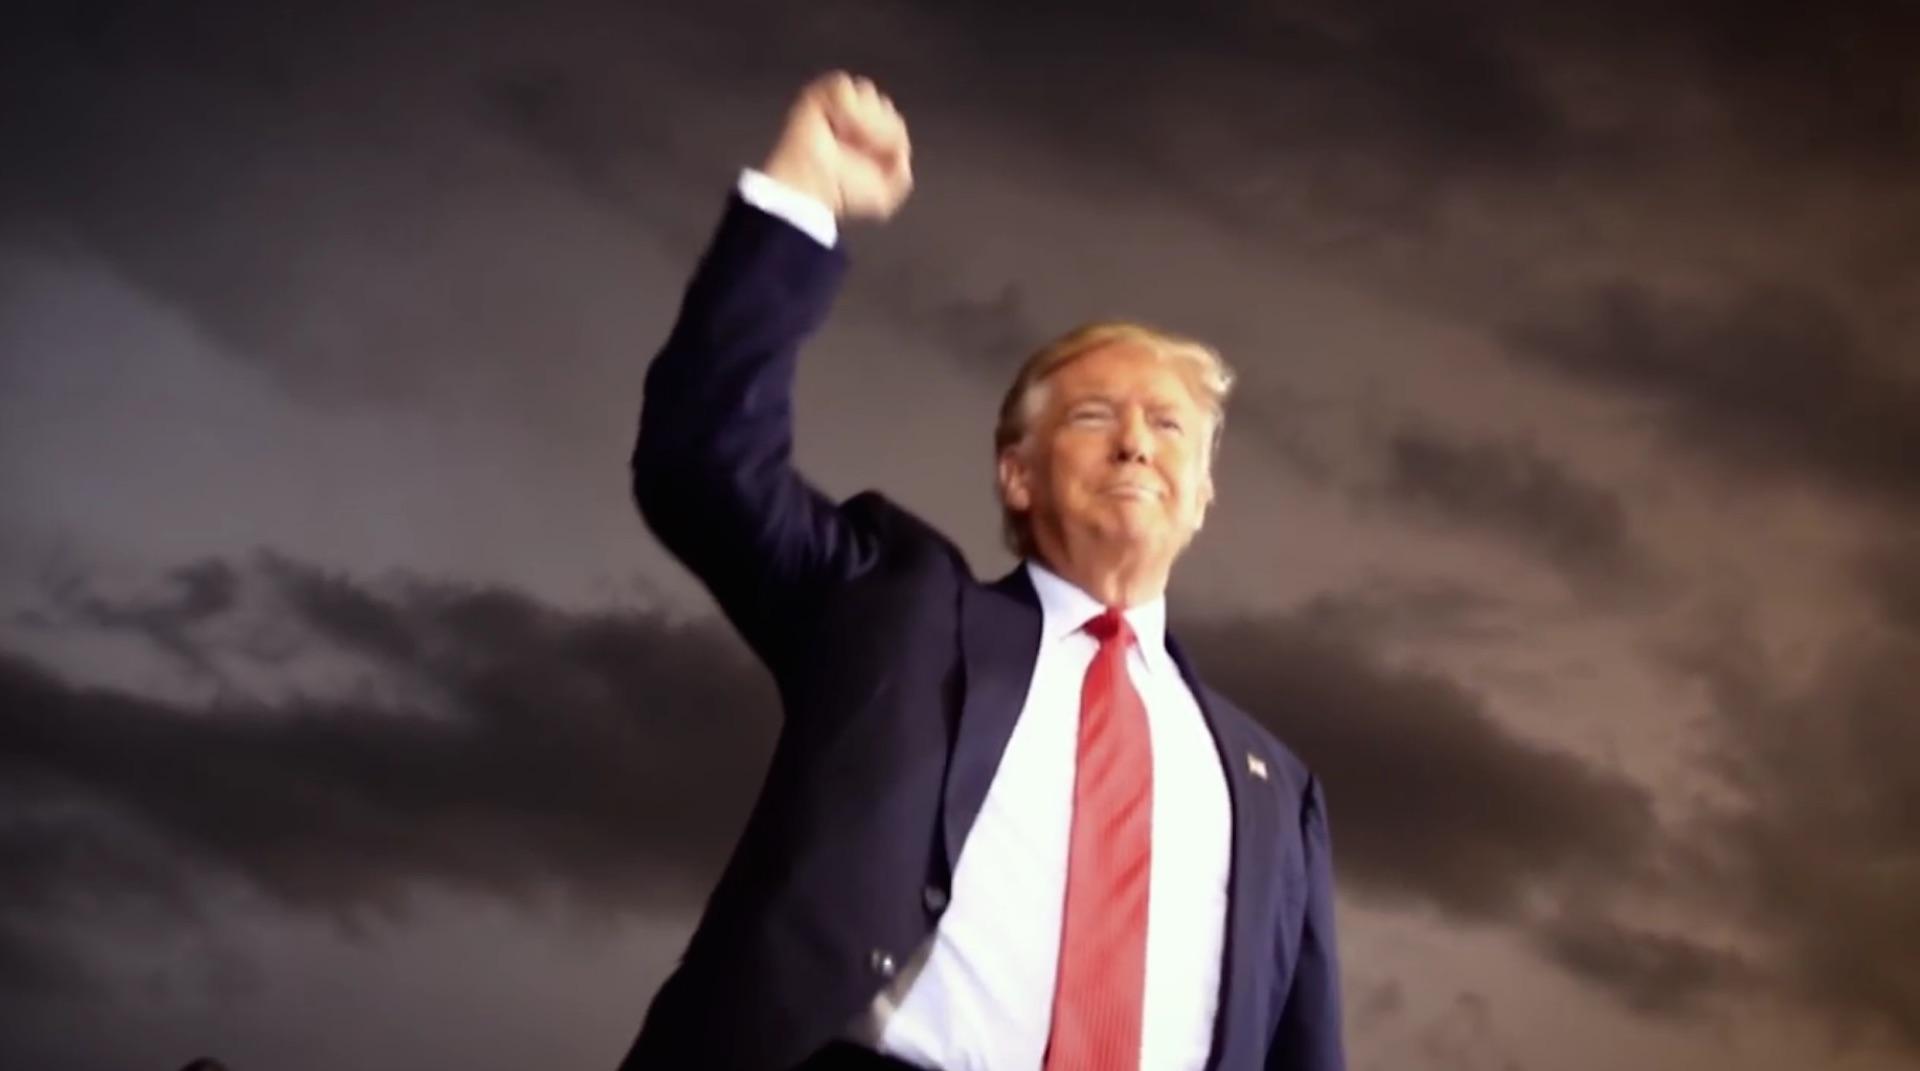 Sen. Al Franken claims that Donald Trump's new ad on the economy is anti-Semitic